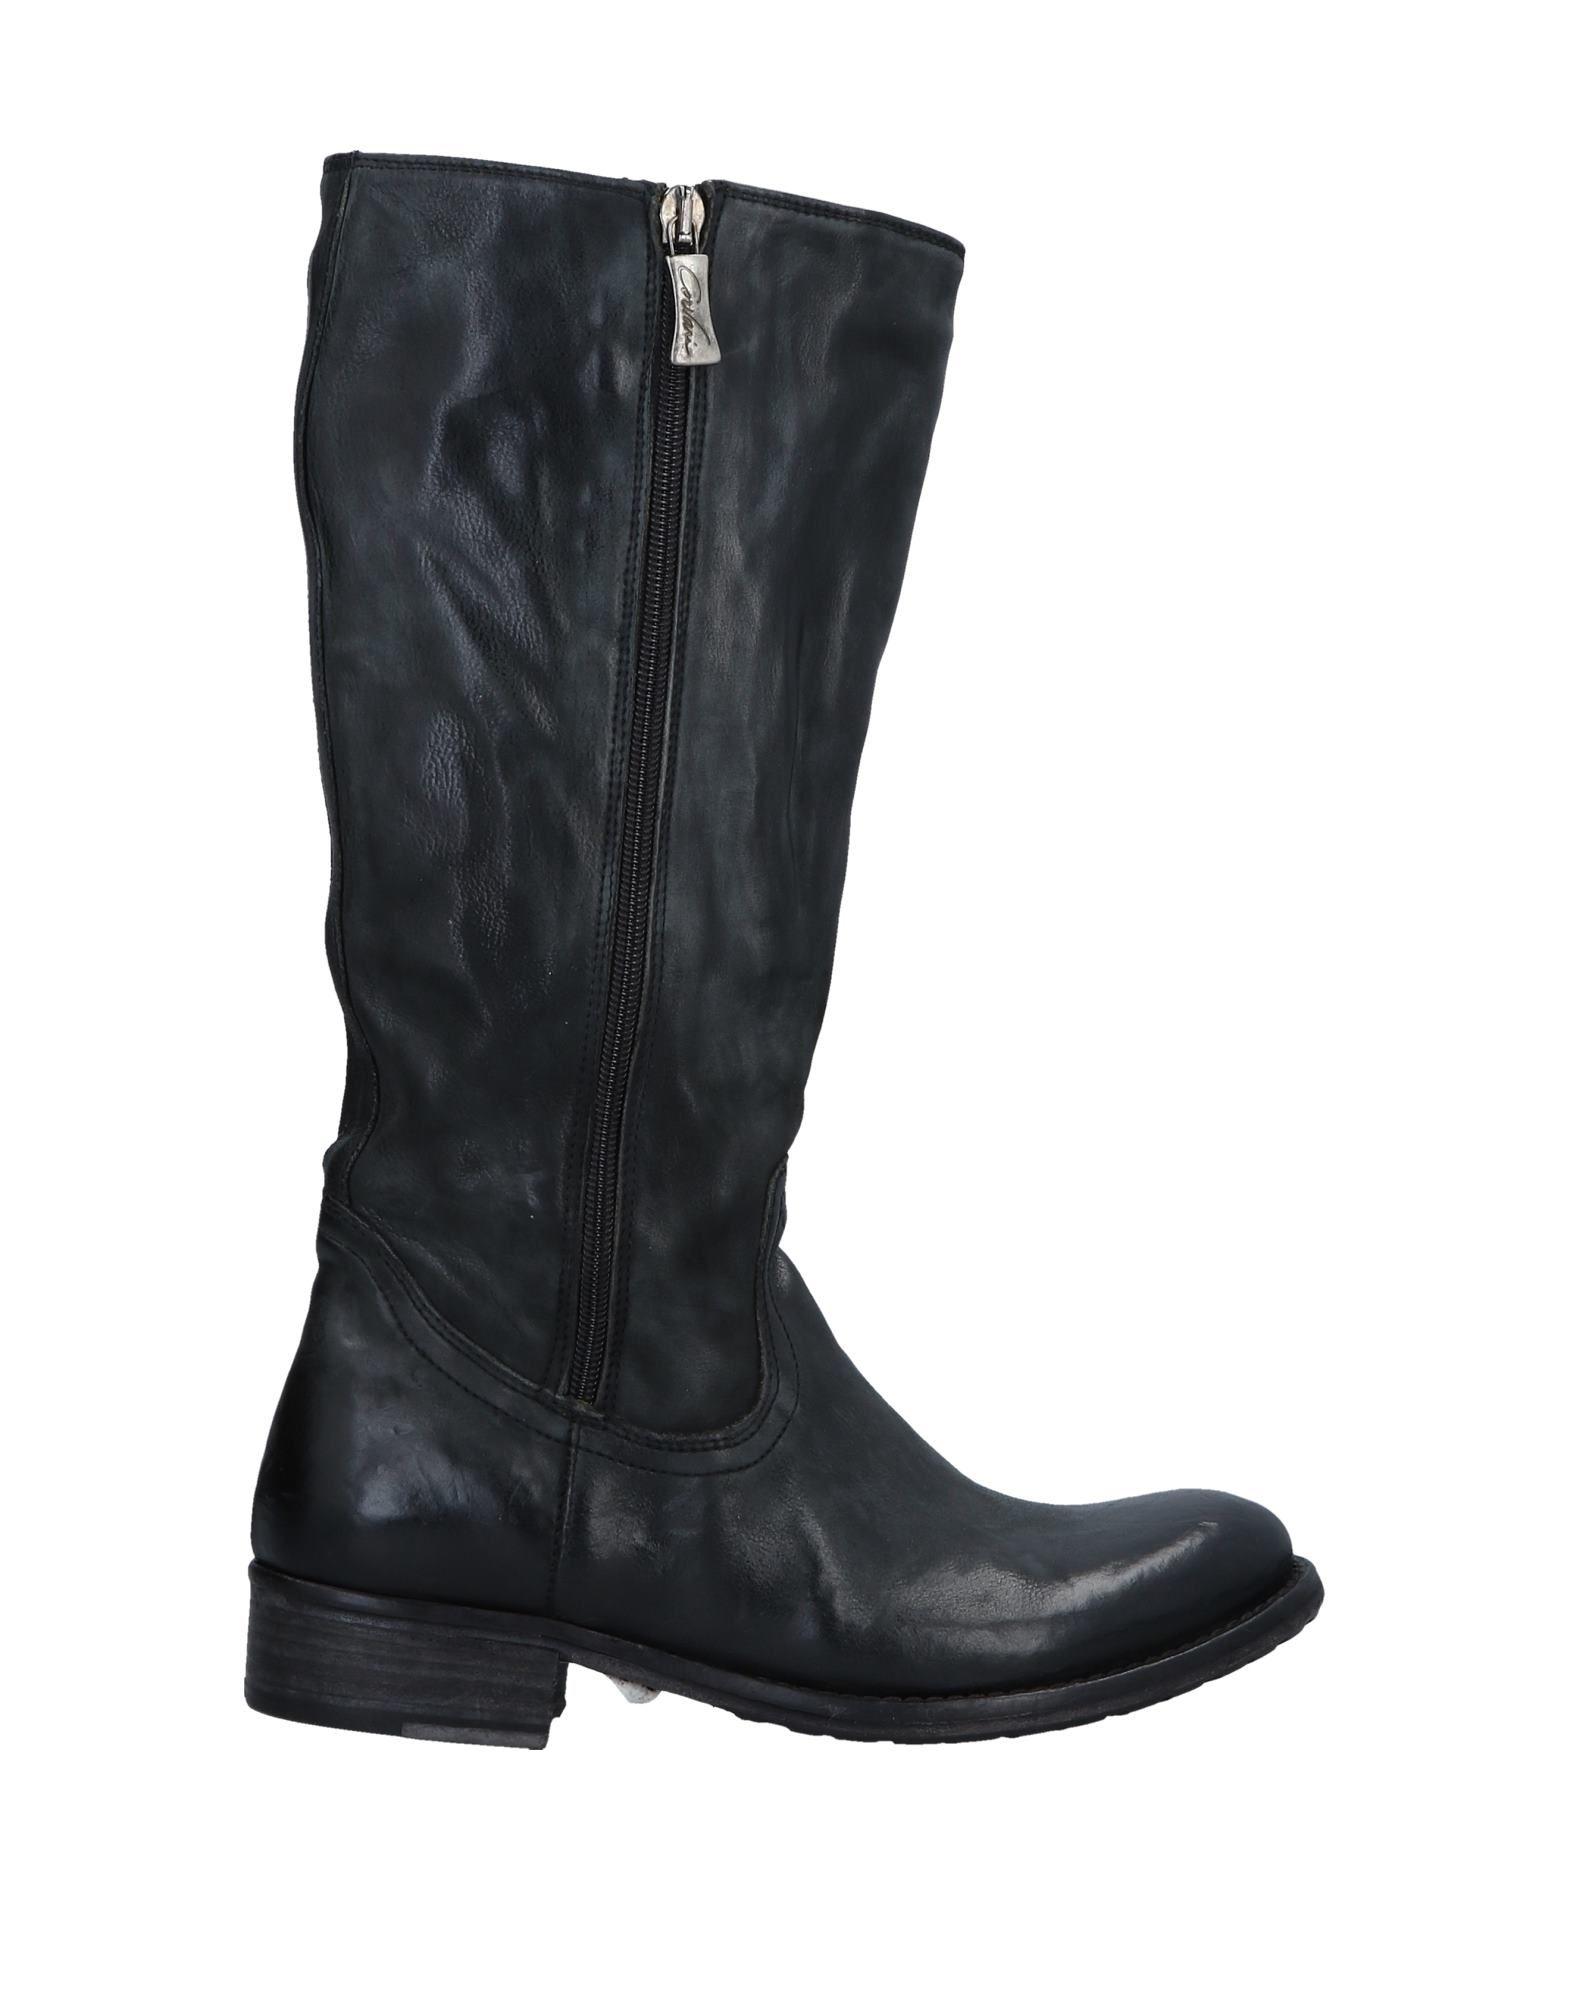 Moda Stivali Corvari Donna - 11514288XM